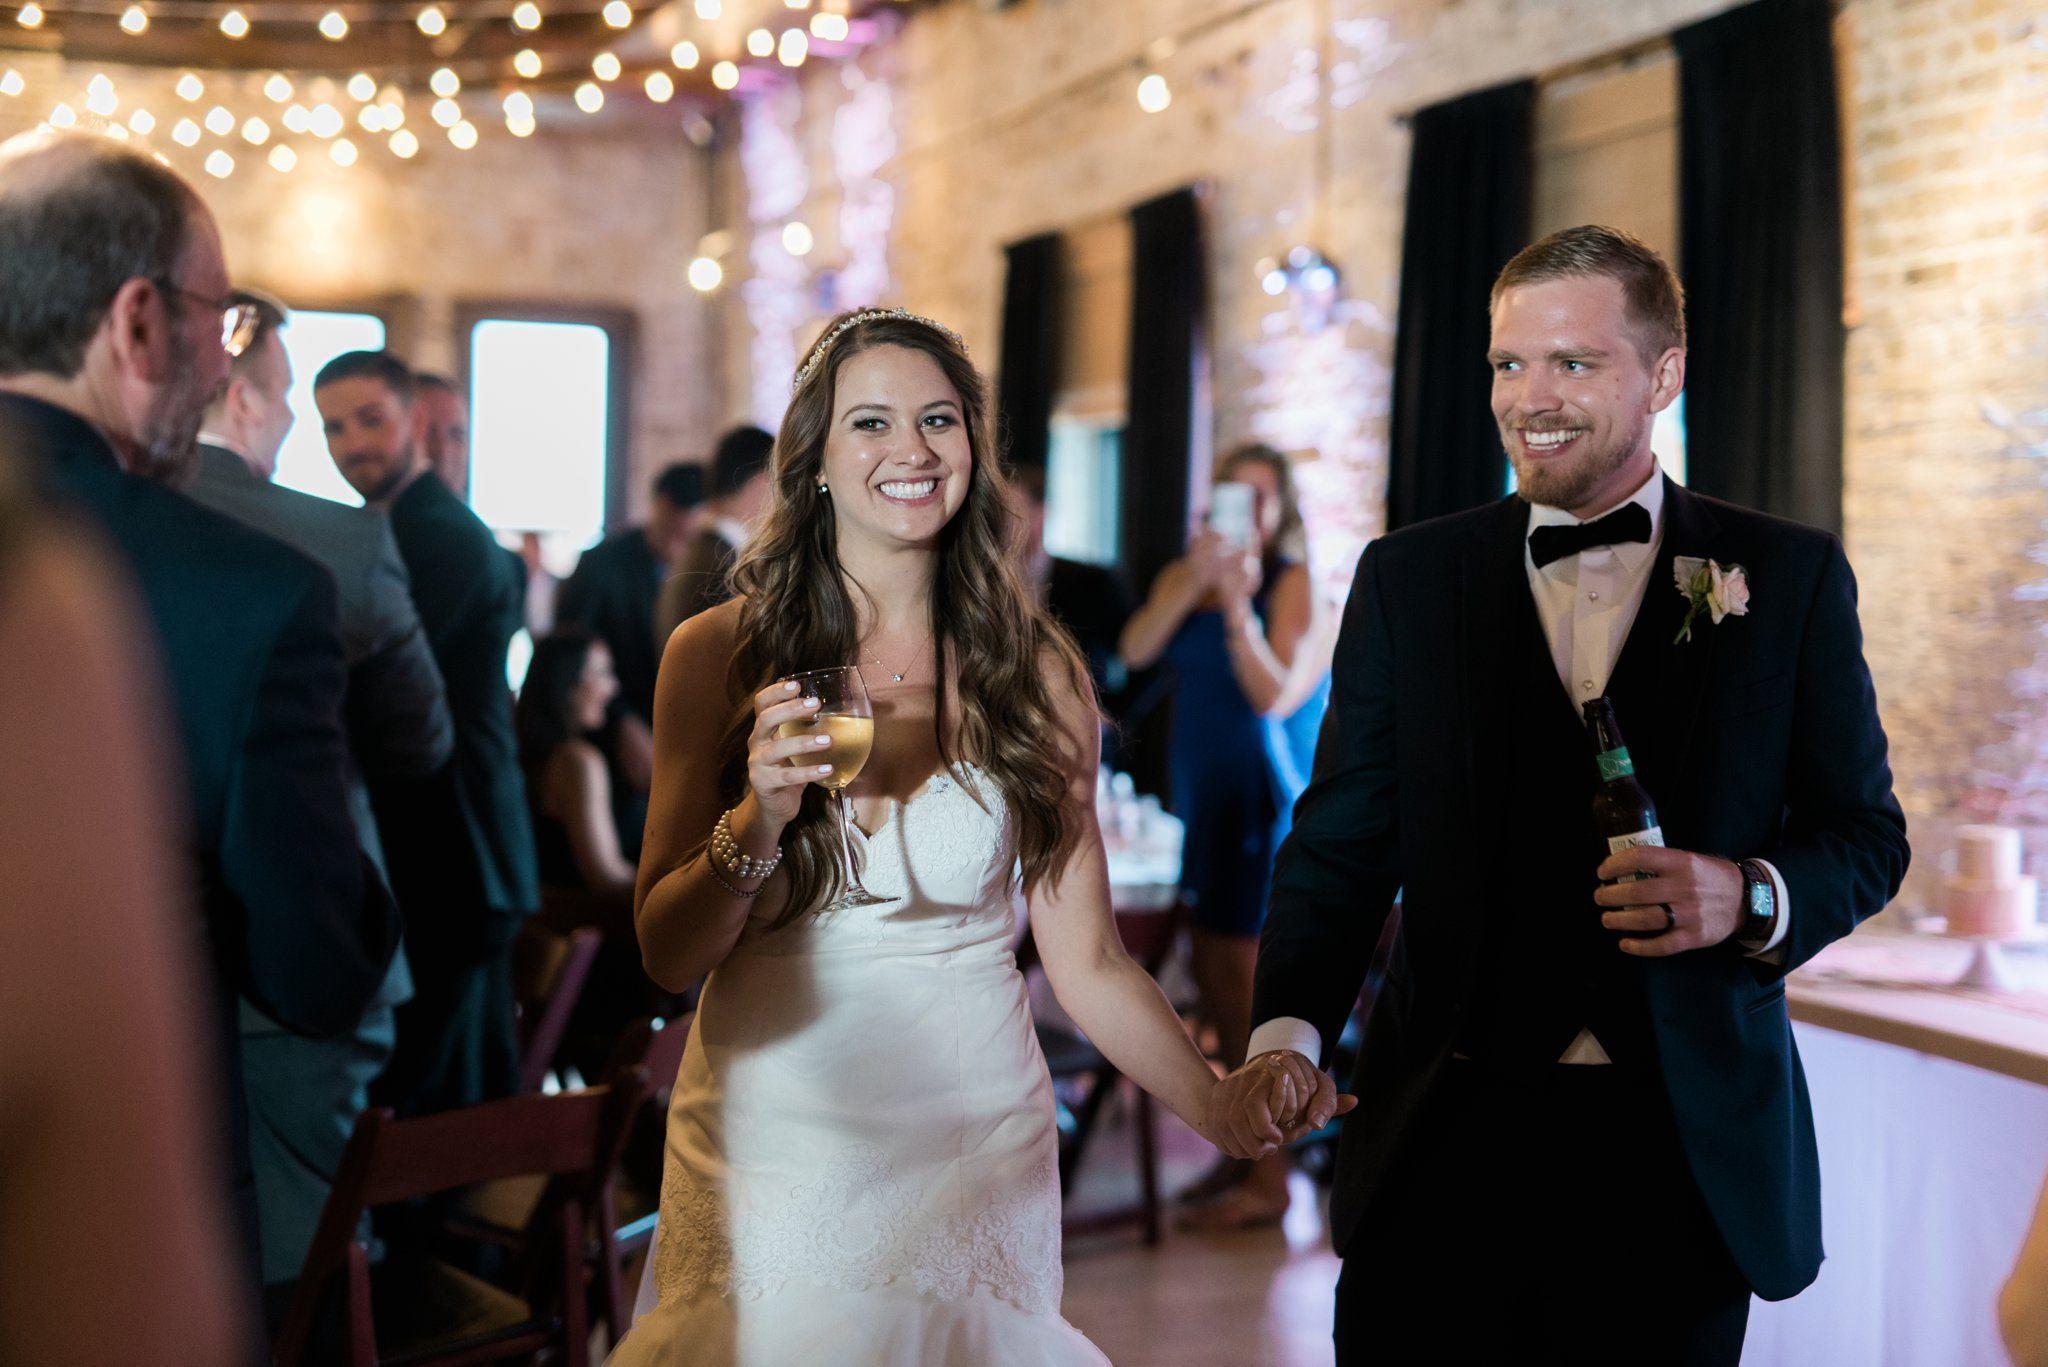 Amanda Zach Milwaukeewisconsinwedding Venues